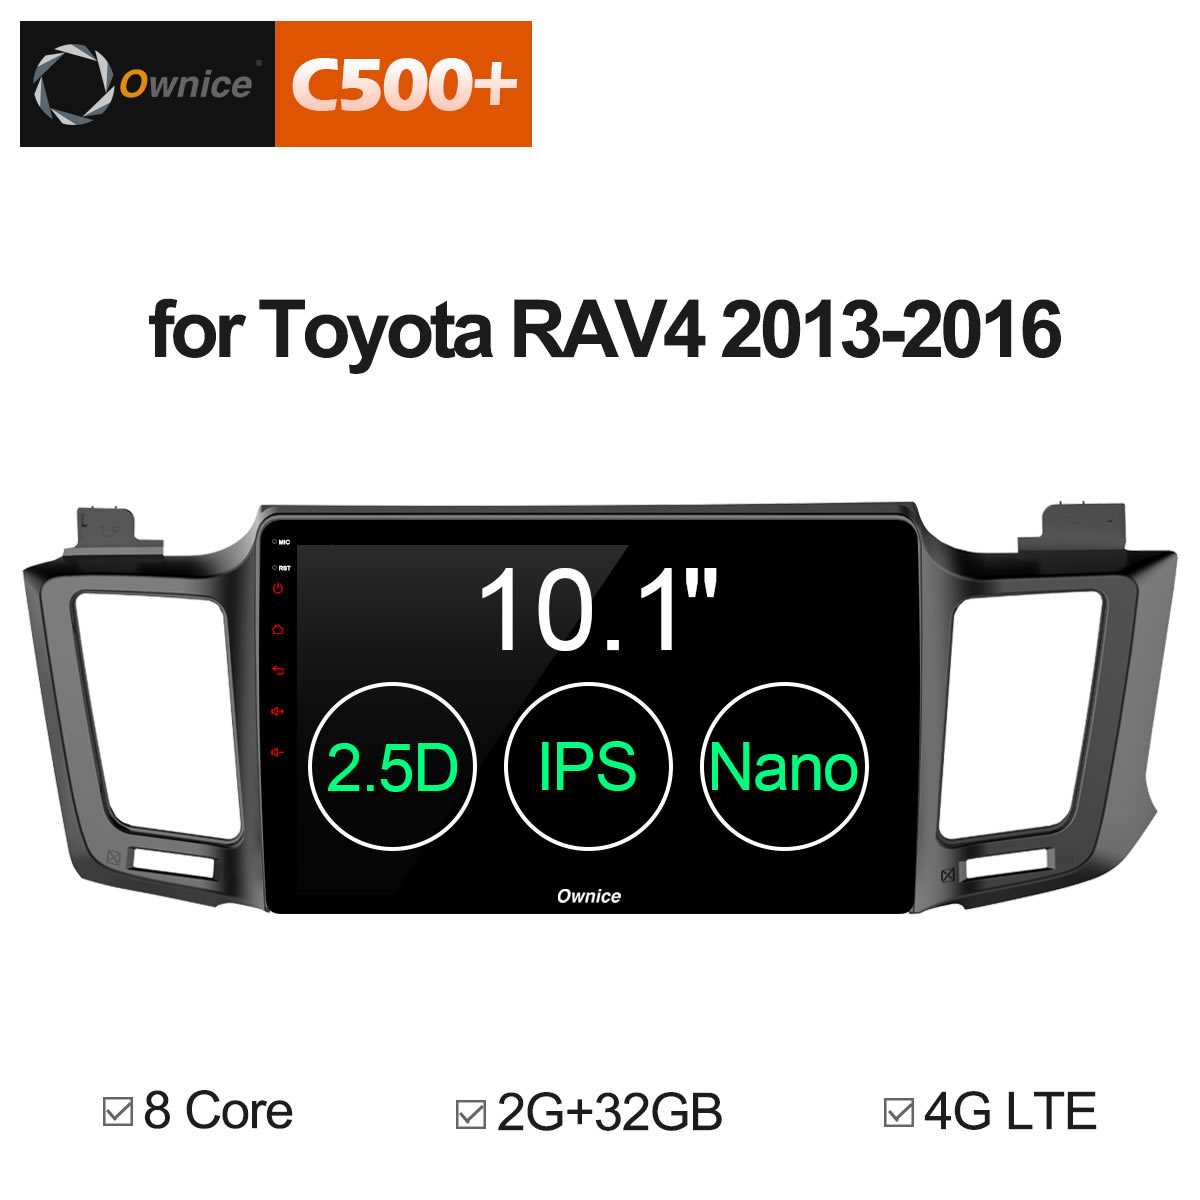 10.1 Ownice C500+ G10 Android 8.1 Octa 8 Core For Toyota RAV4 2013-2015 2016 Car DVD player Navigation GPS Radio 2G RAM 4G LTE 10 1 ownice c500 g10 octa 8 core android 8 1 car dvd gps player for toyota tundra 2007 2013 sequoia 2008 2018 stereo radio